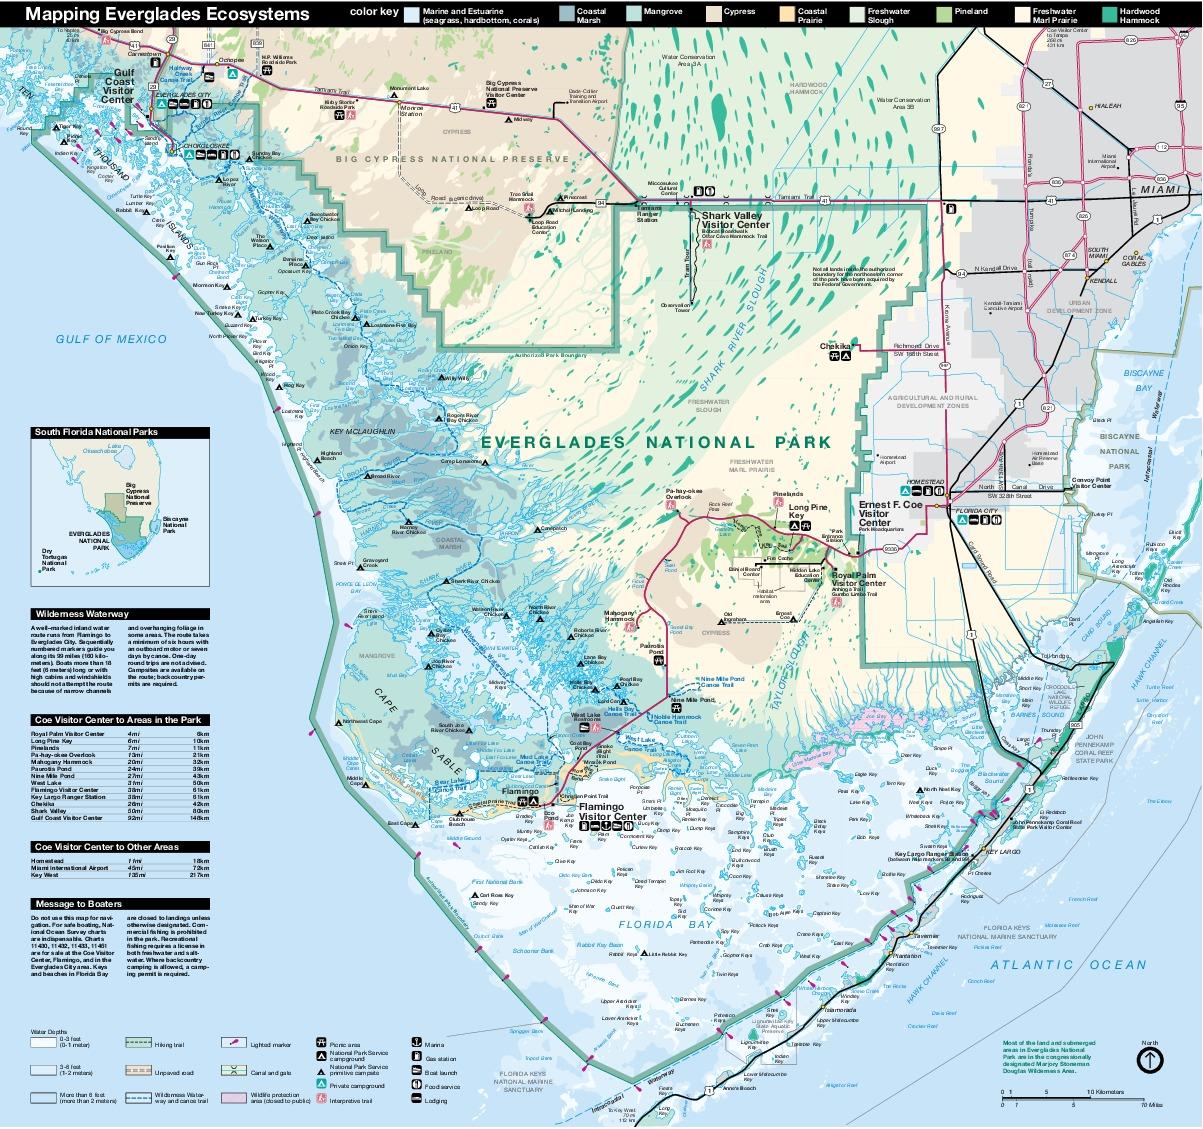 Everglades National Park Map, Florida, United States